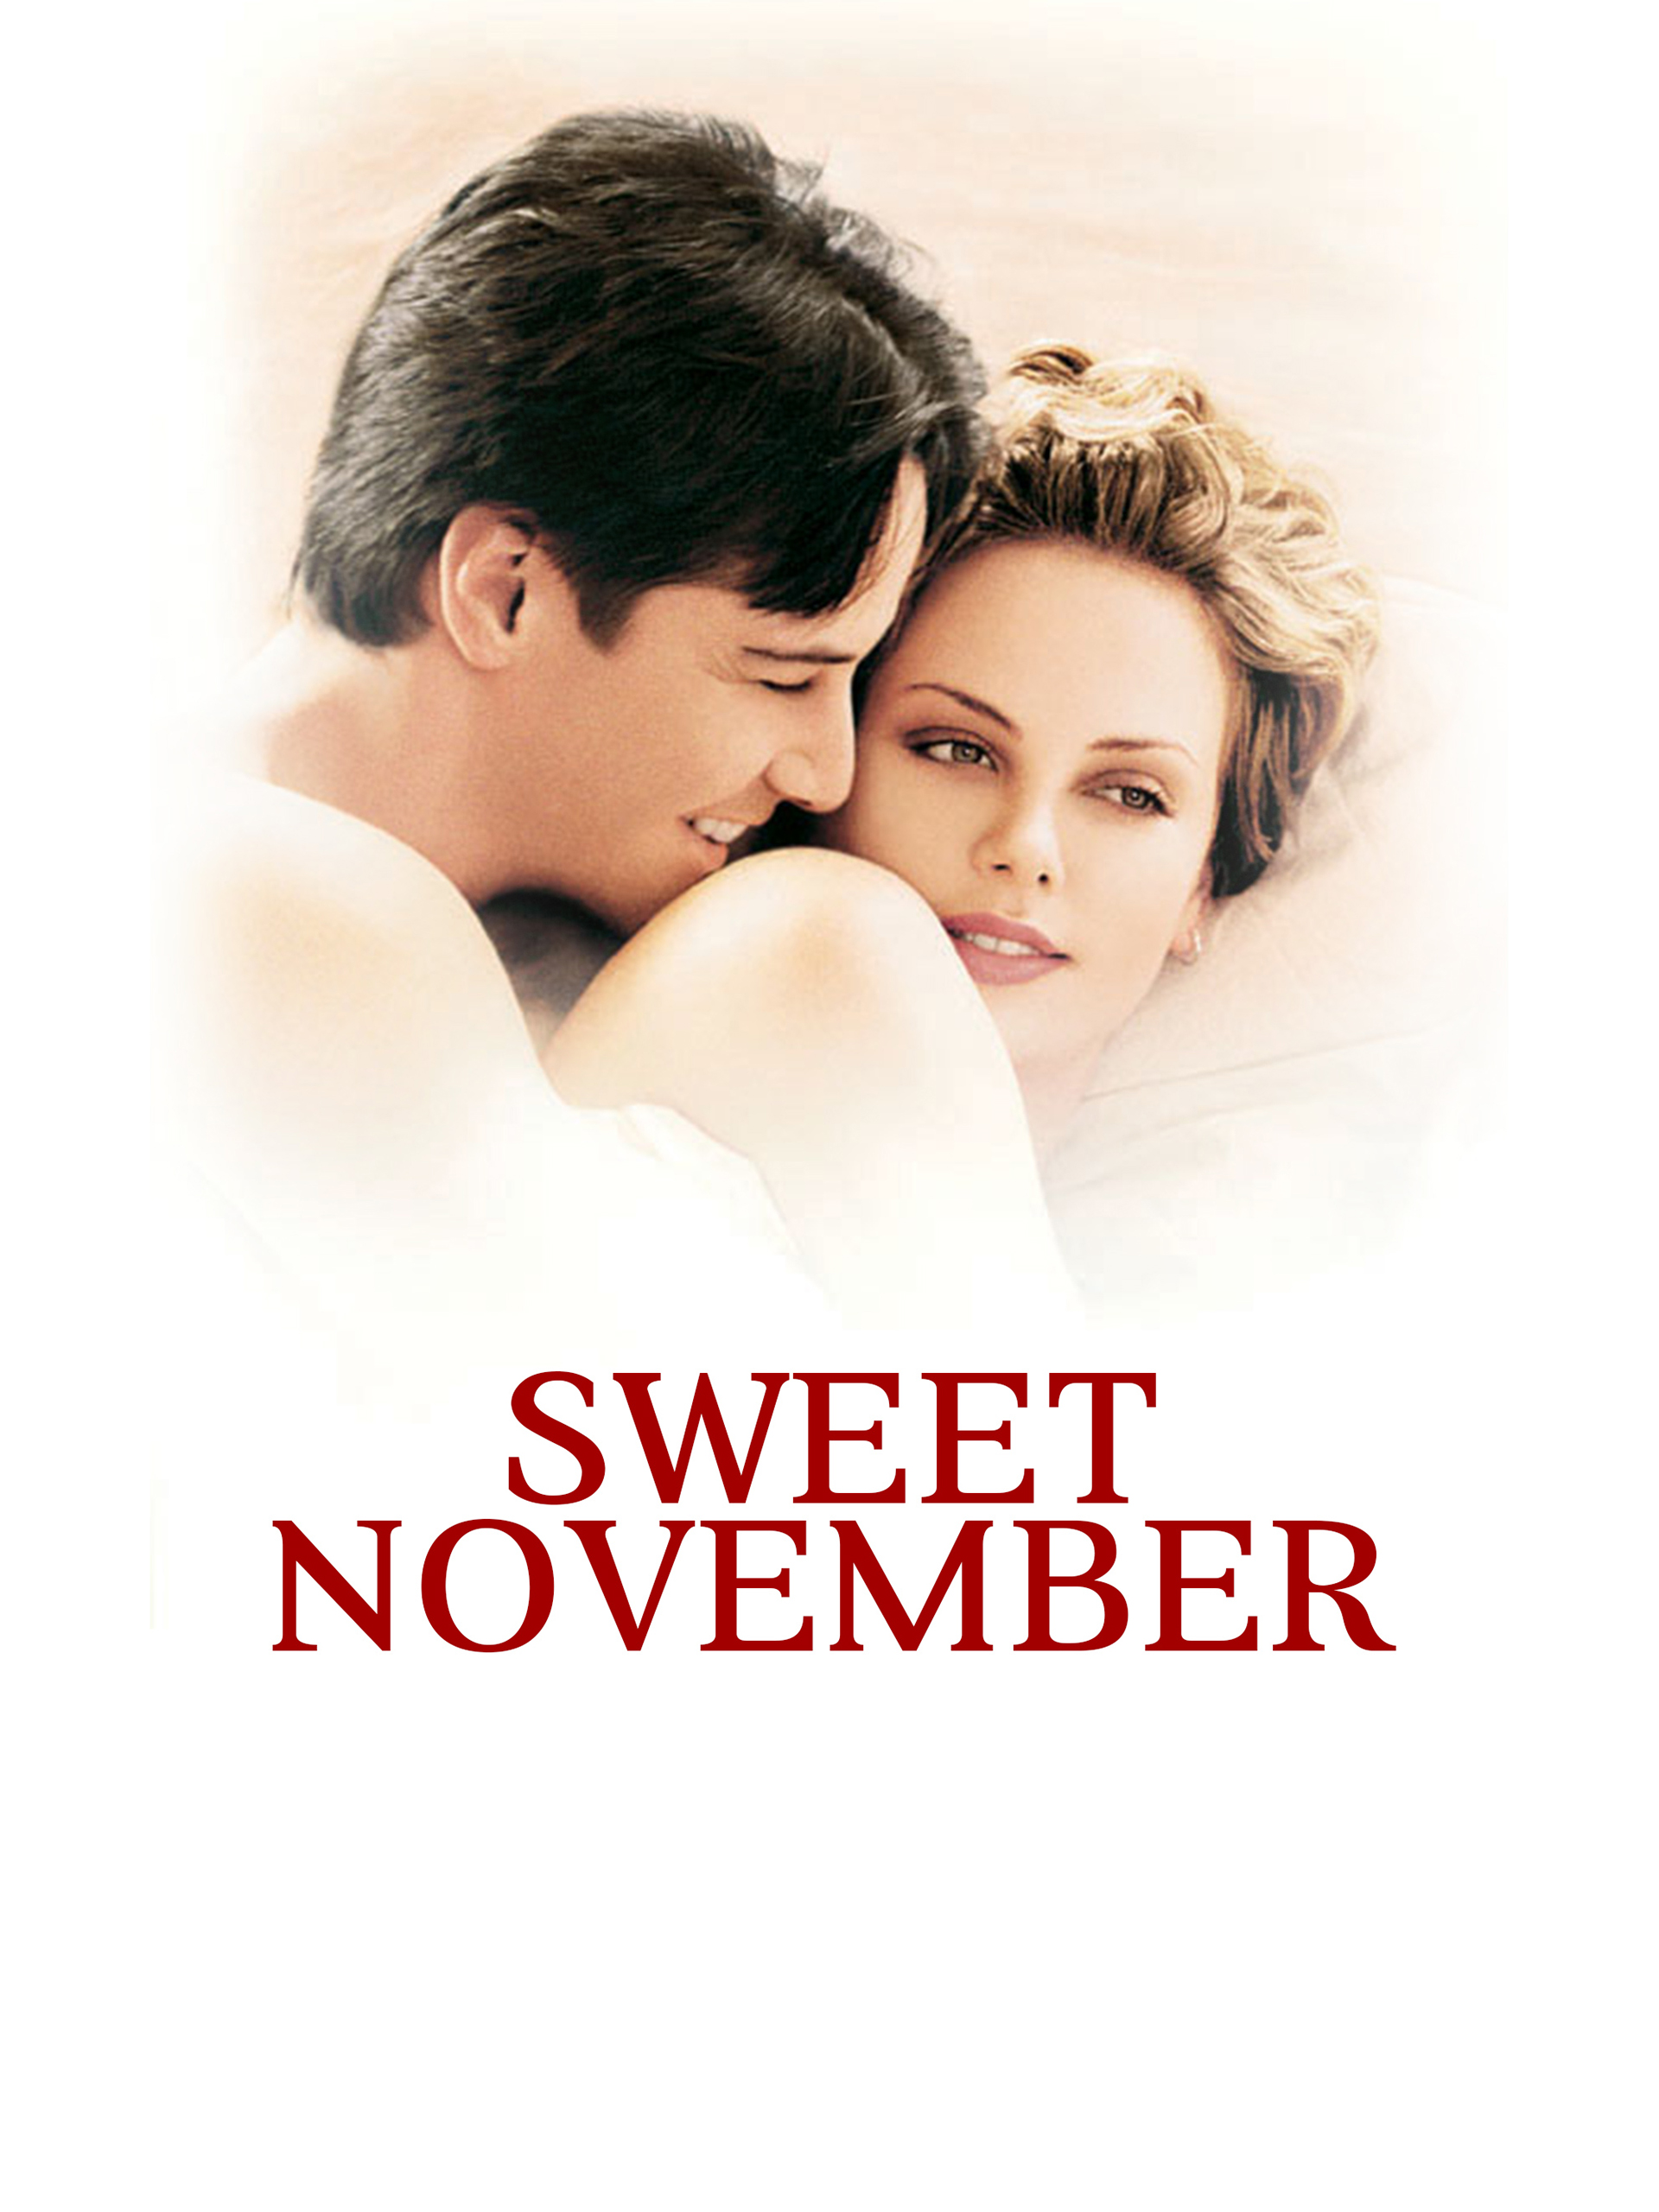 برايم فيديو: Sweet November (2001)